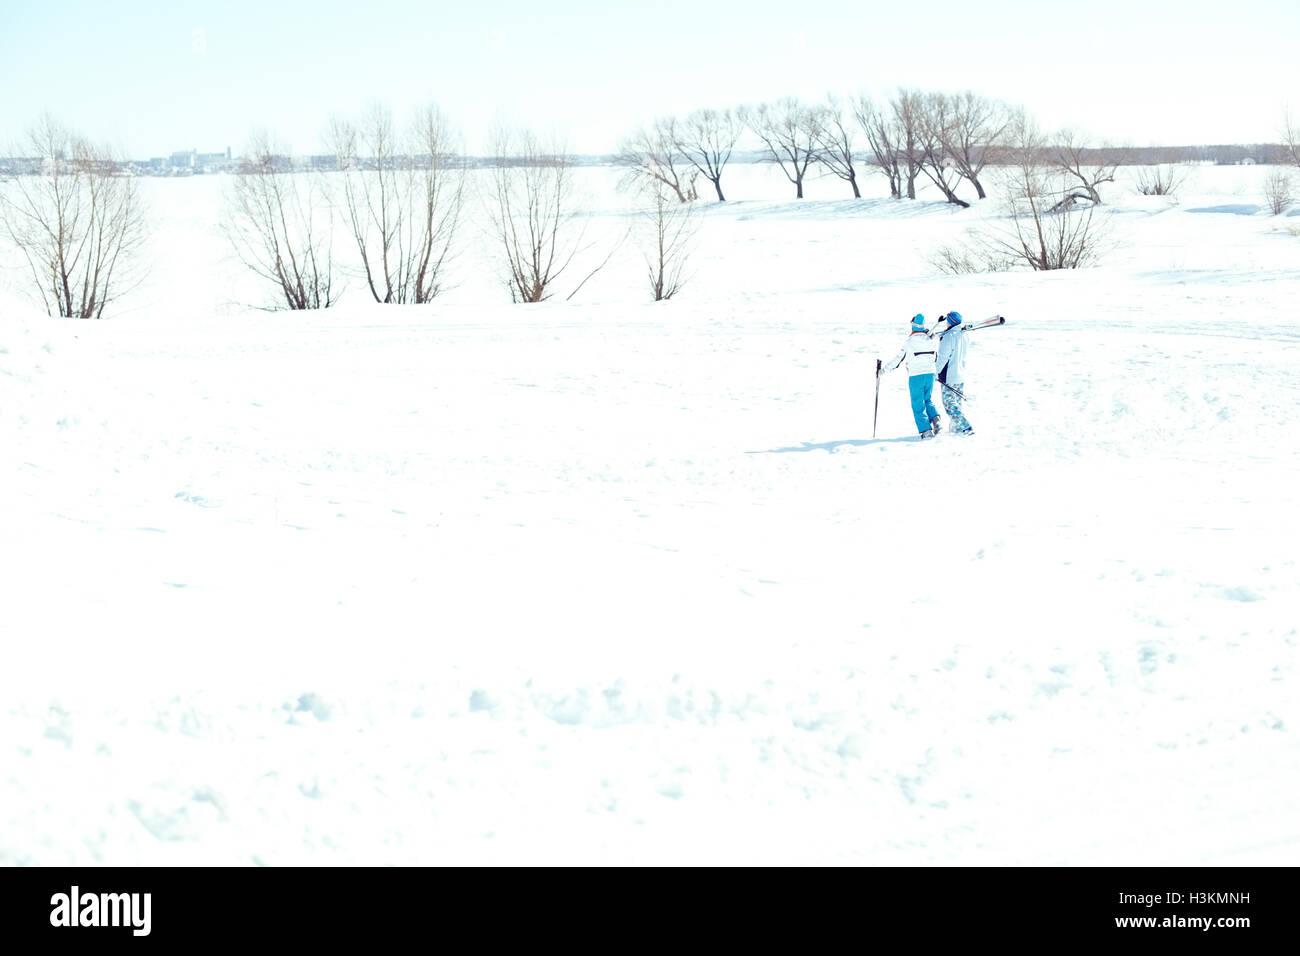 Ski race - Stock Image